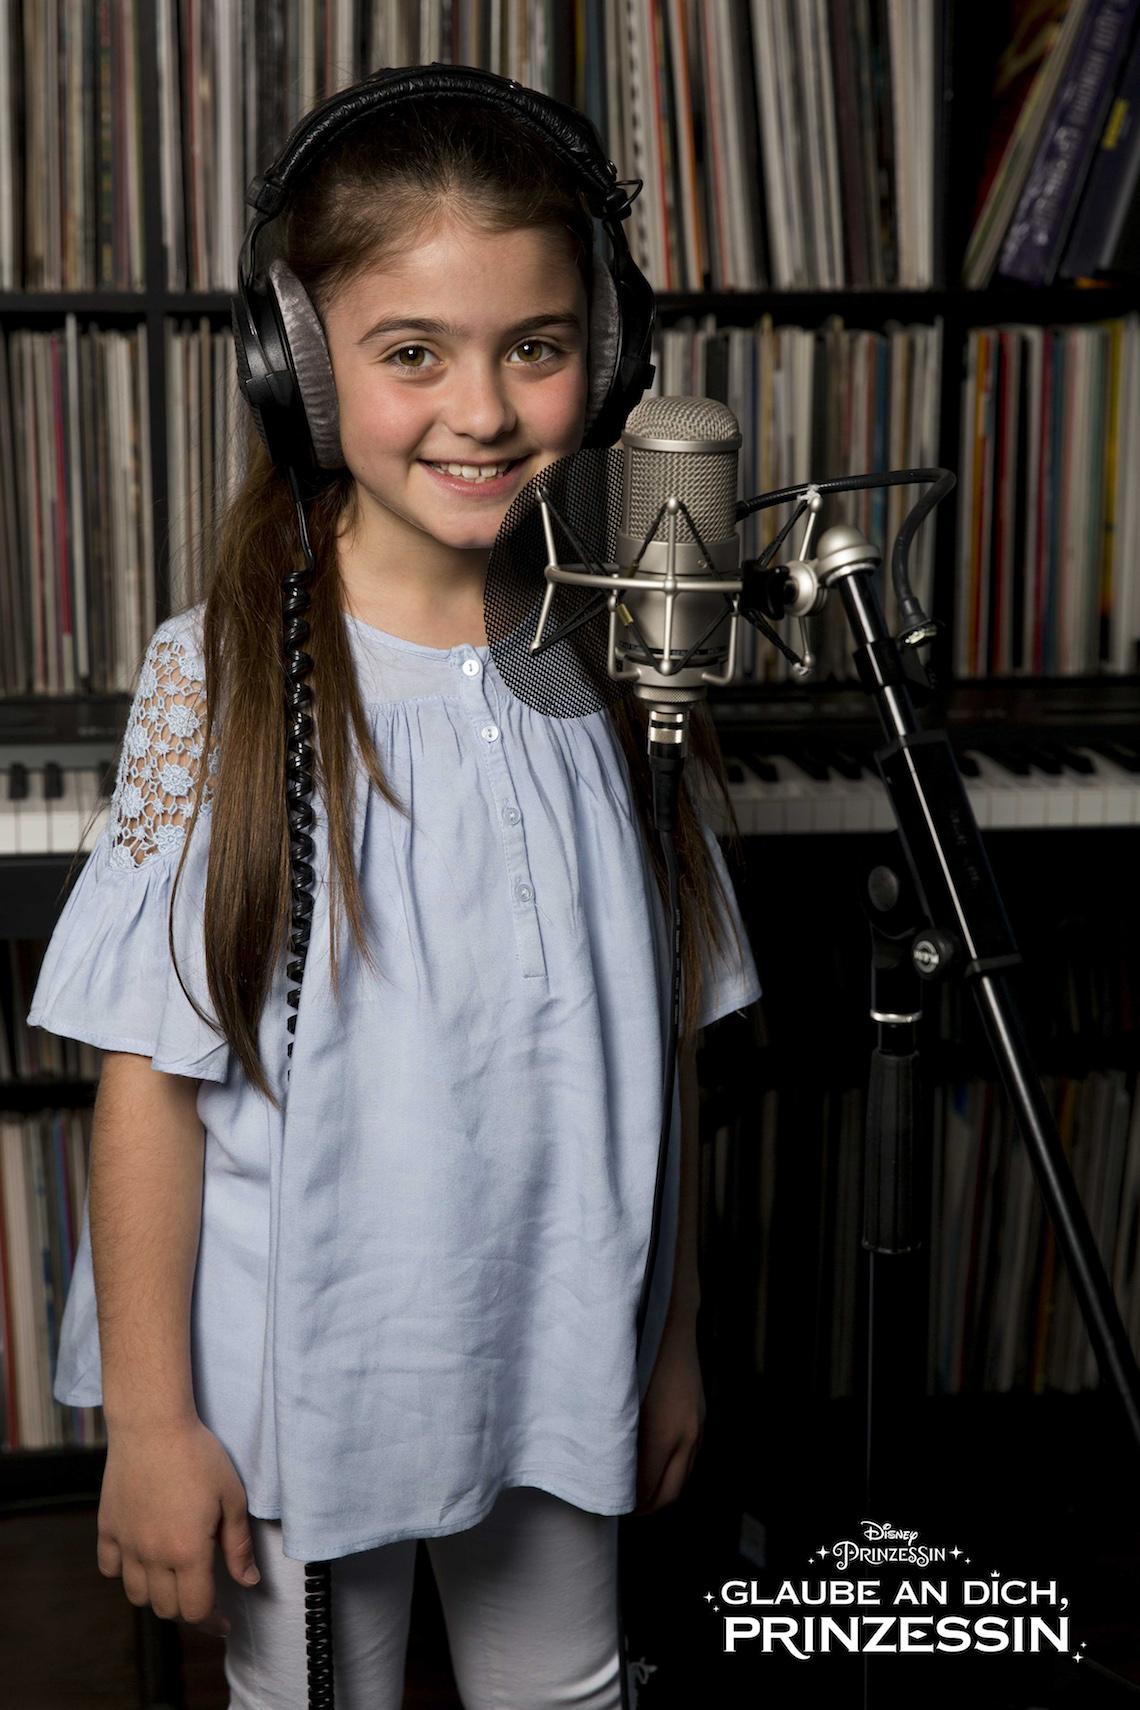 Mädelsschnack l The Voice Kids Disney